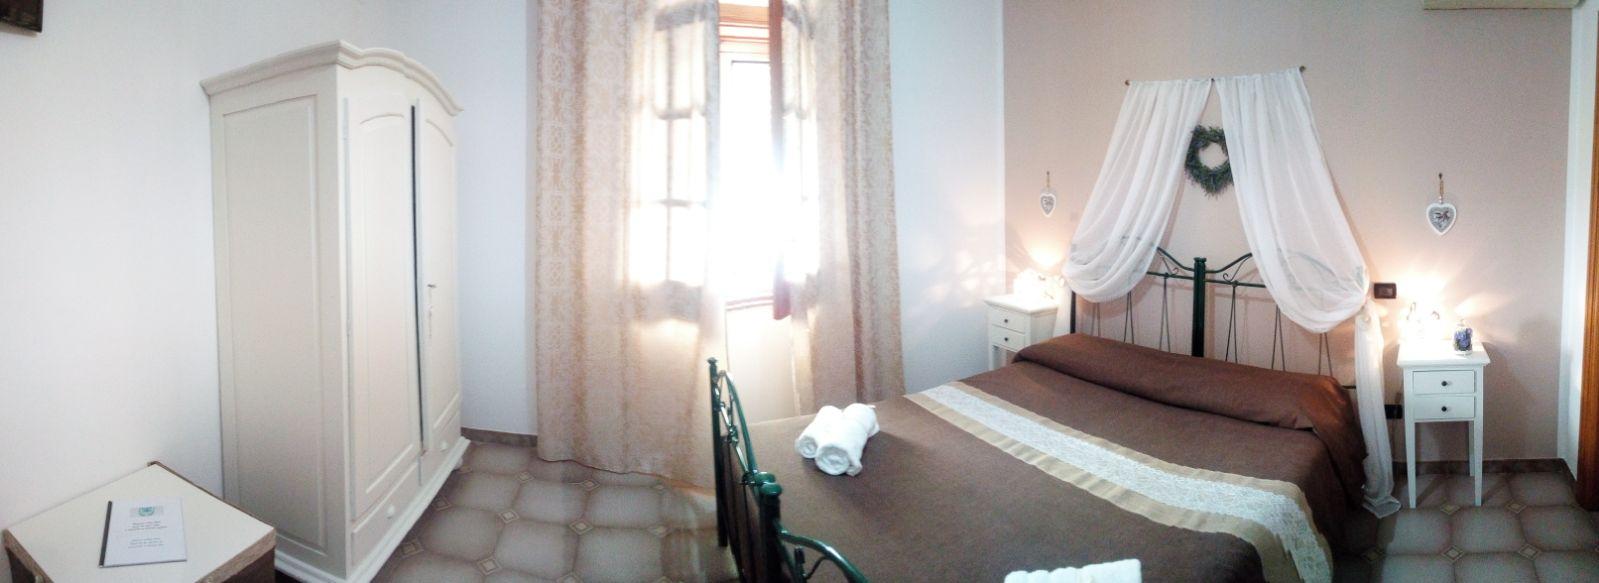 Villa_Plasi_Menfi_Appartamento_Camere_1